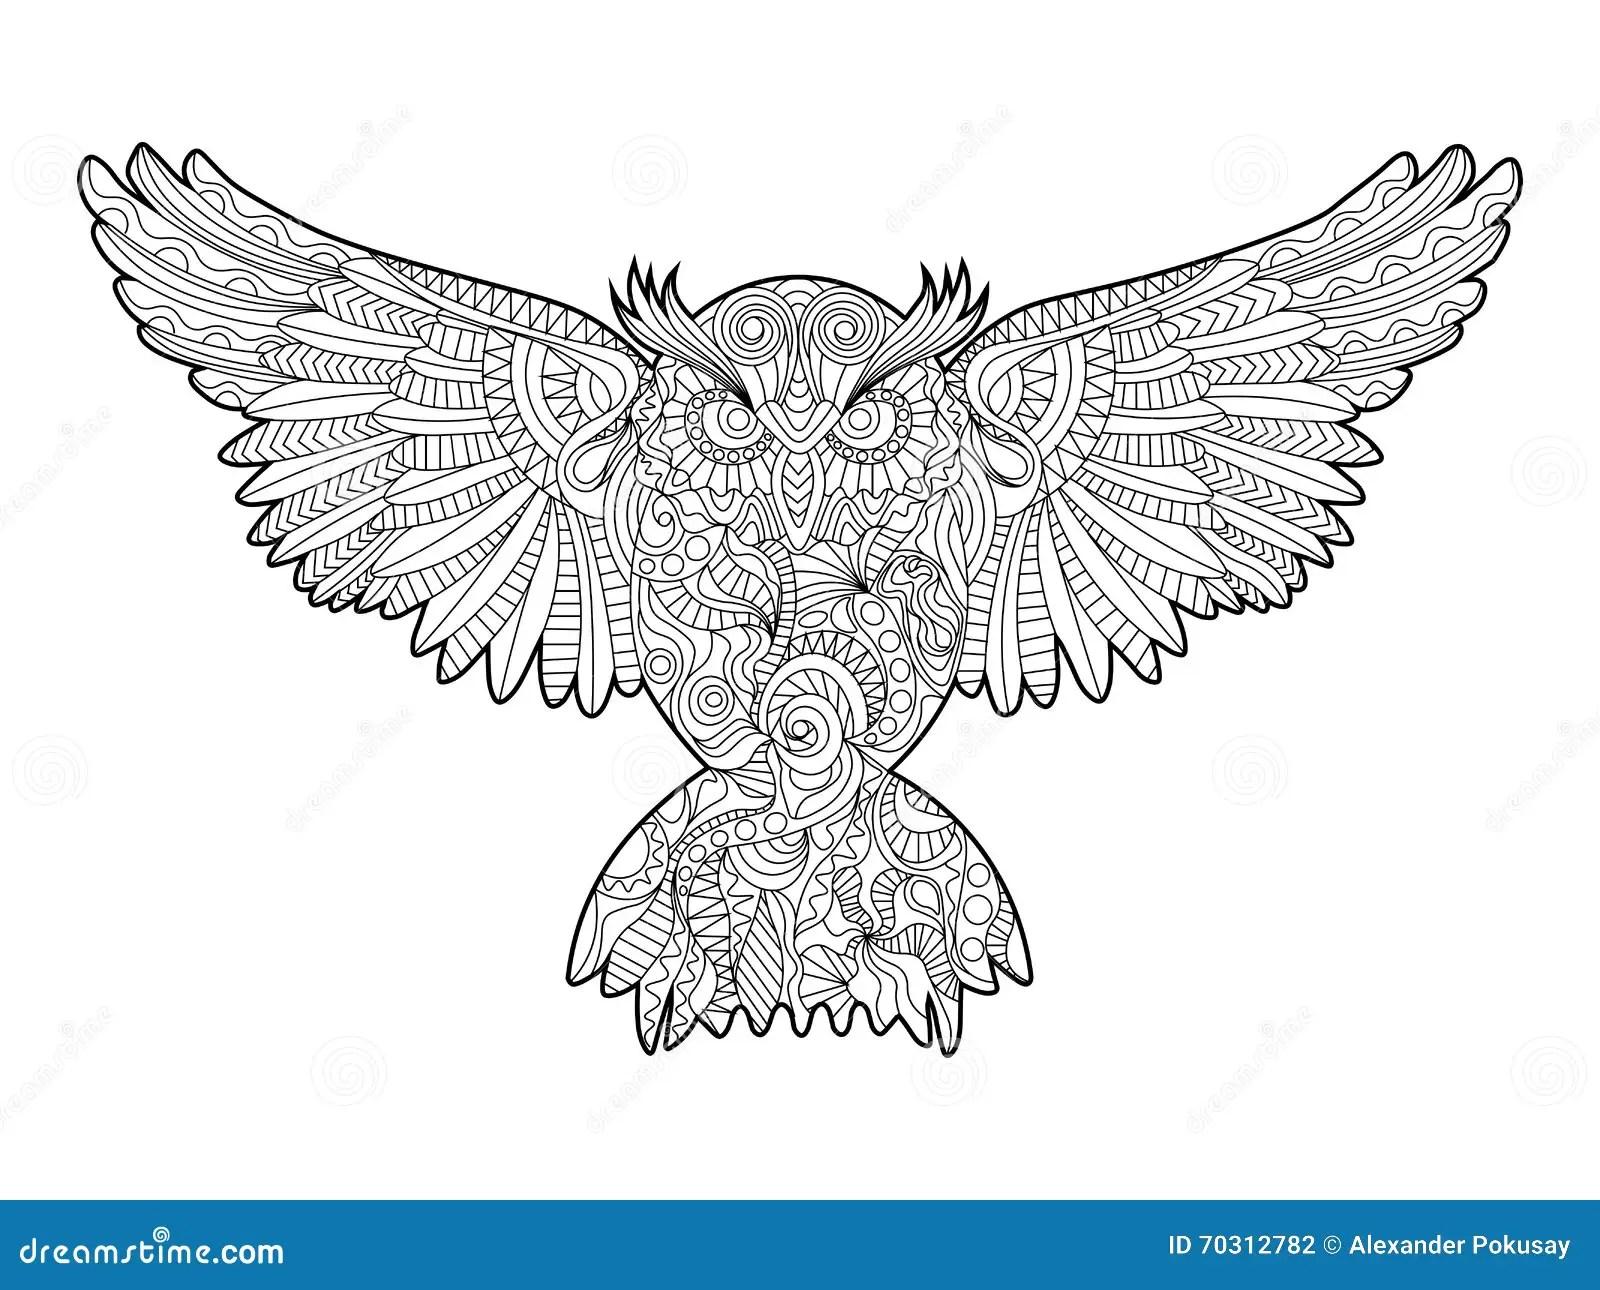 Easy Cartoon Eagle